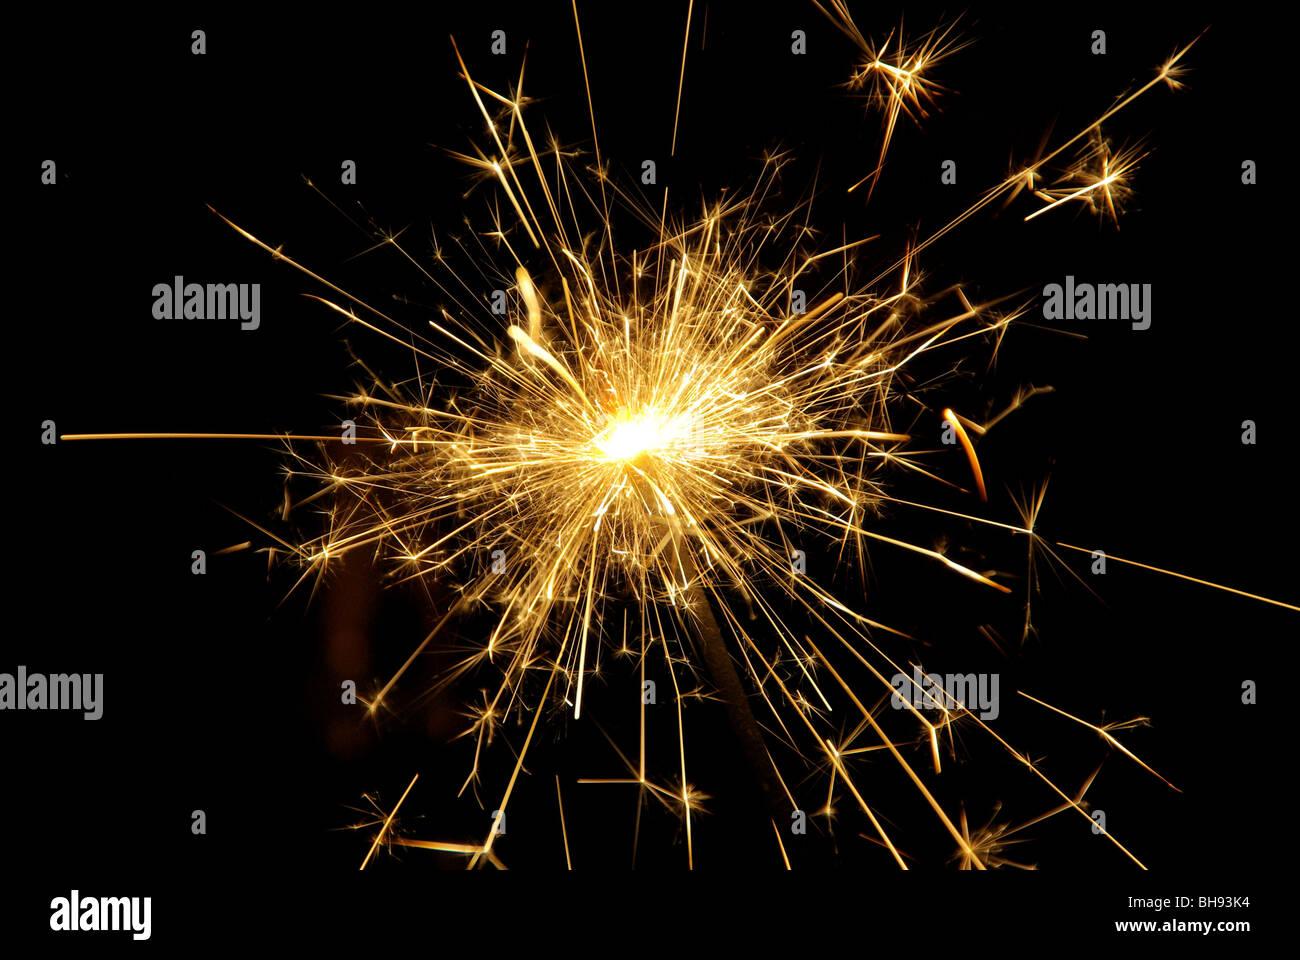 Wunderkerze - sparkler 05 - Stock Image